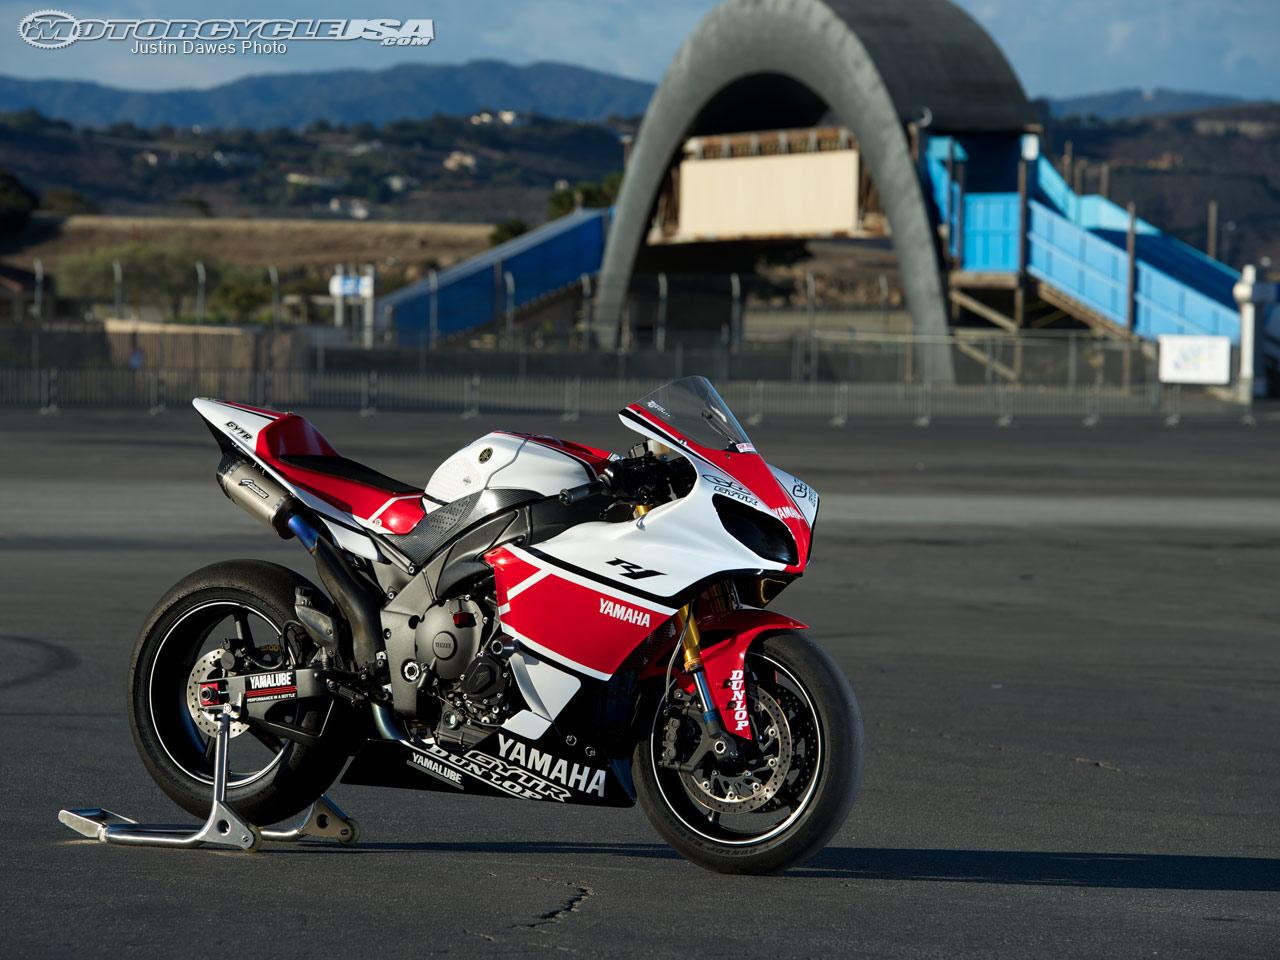 Yamaha R1 Crossplane 12_Yamaha_YXF-R1_Project_Laguna_3